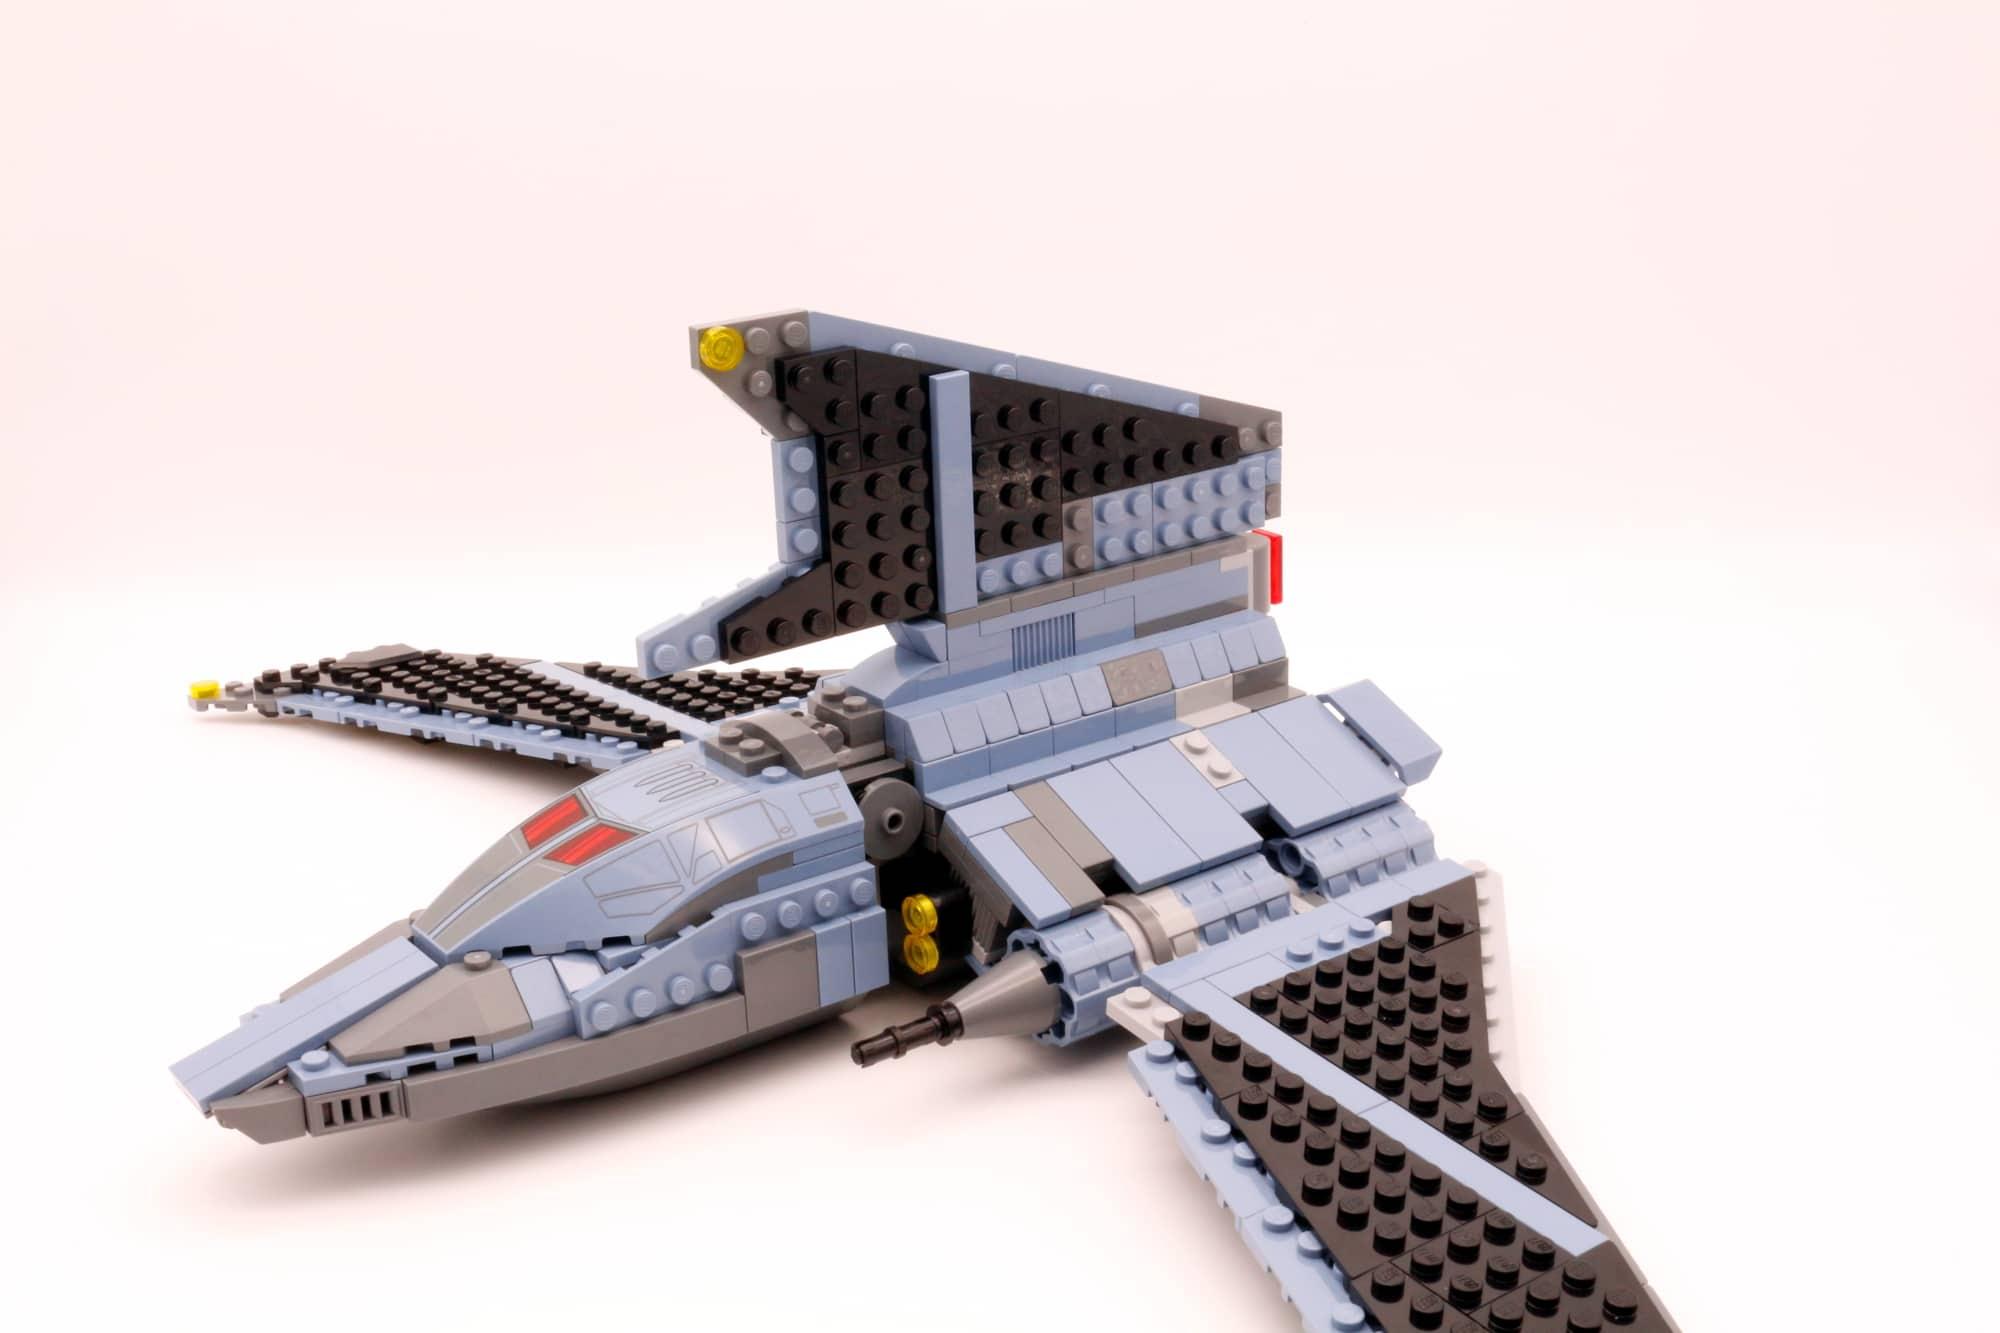 LEGO Star Wars 75314 The Bad Batch Attack Shuttle 8